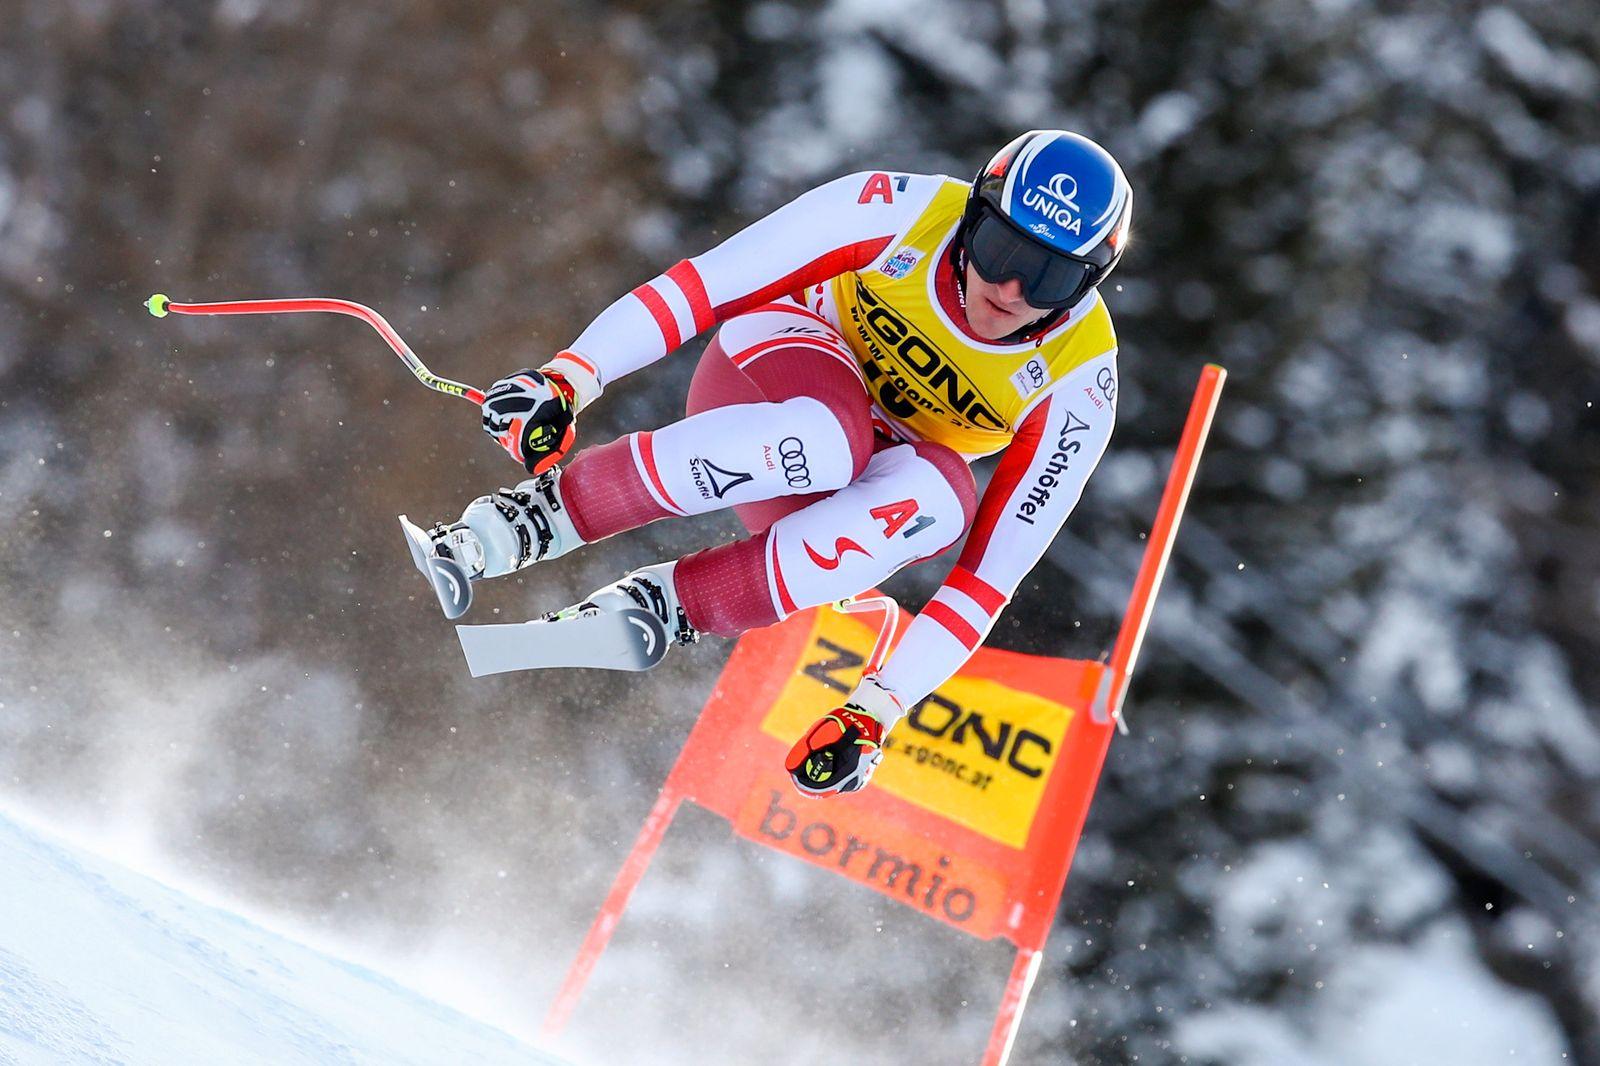 Ski alpin - Weltcup in Bormio